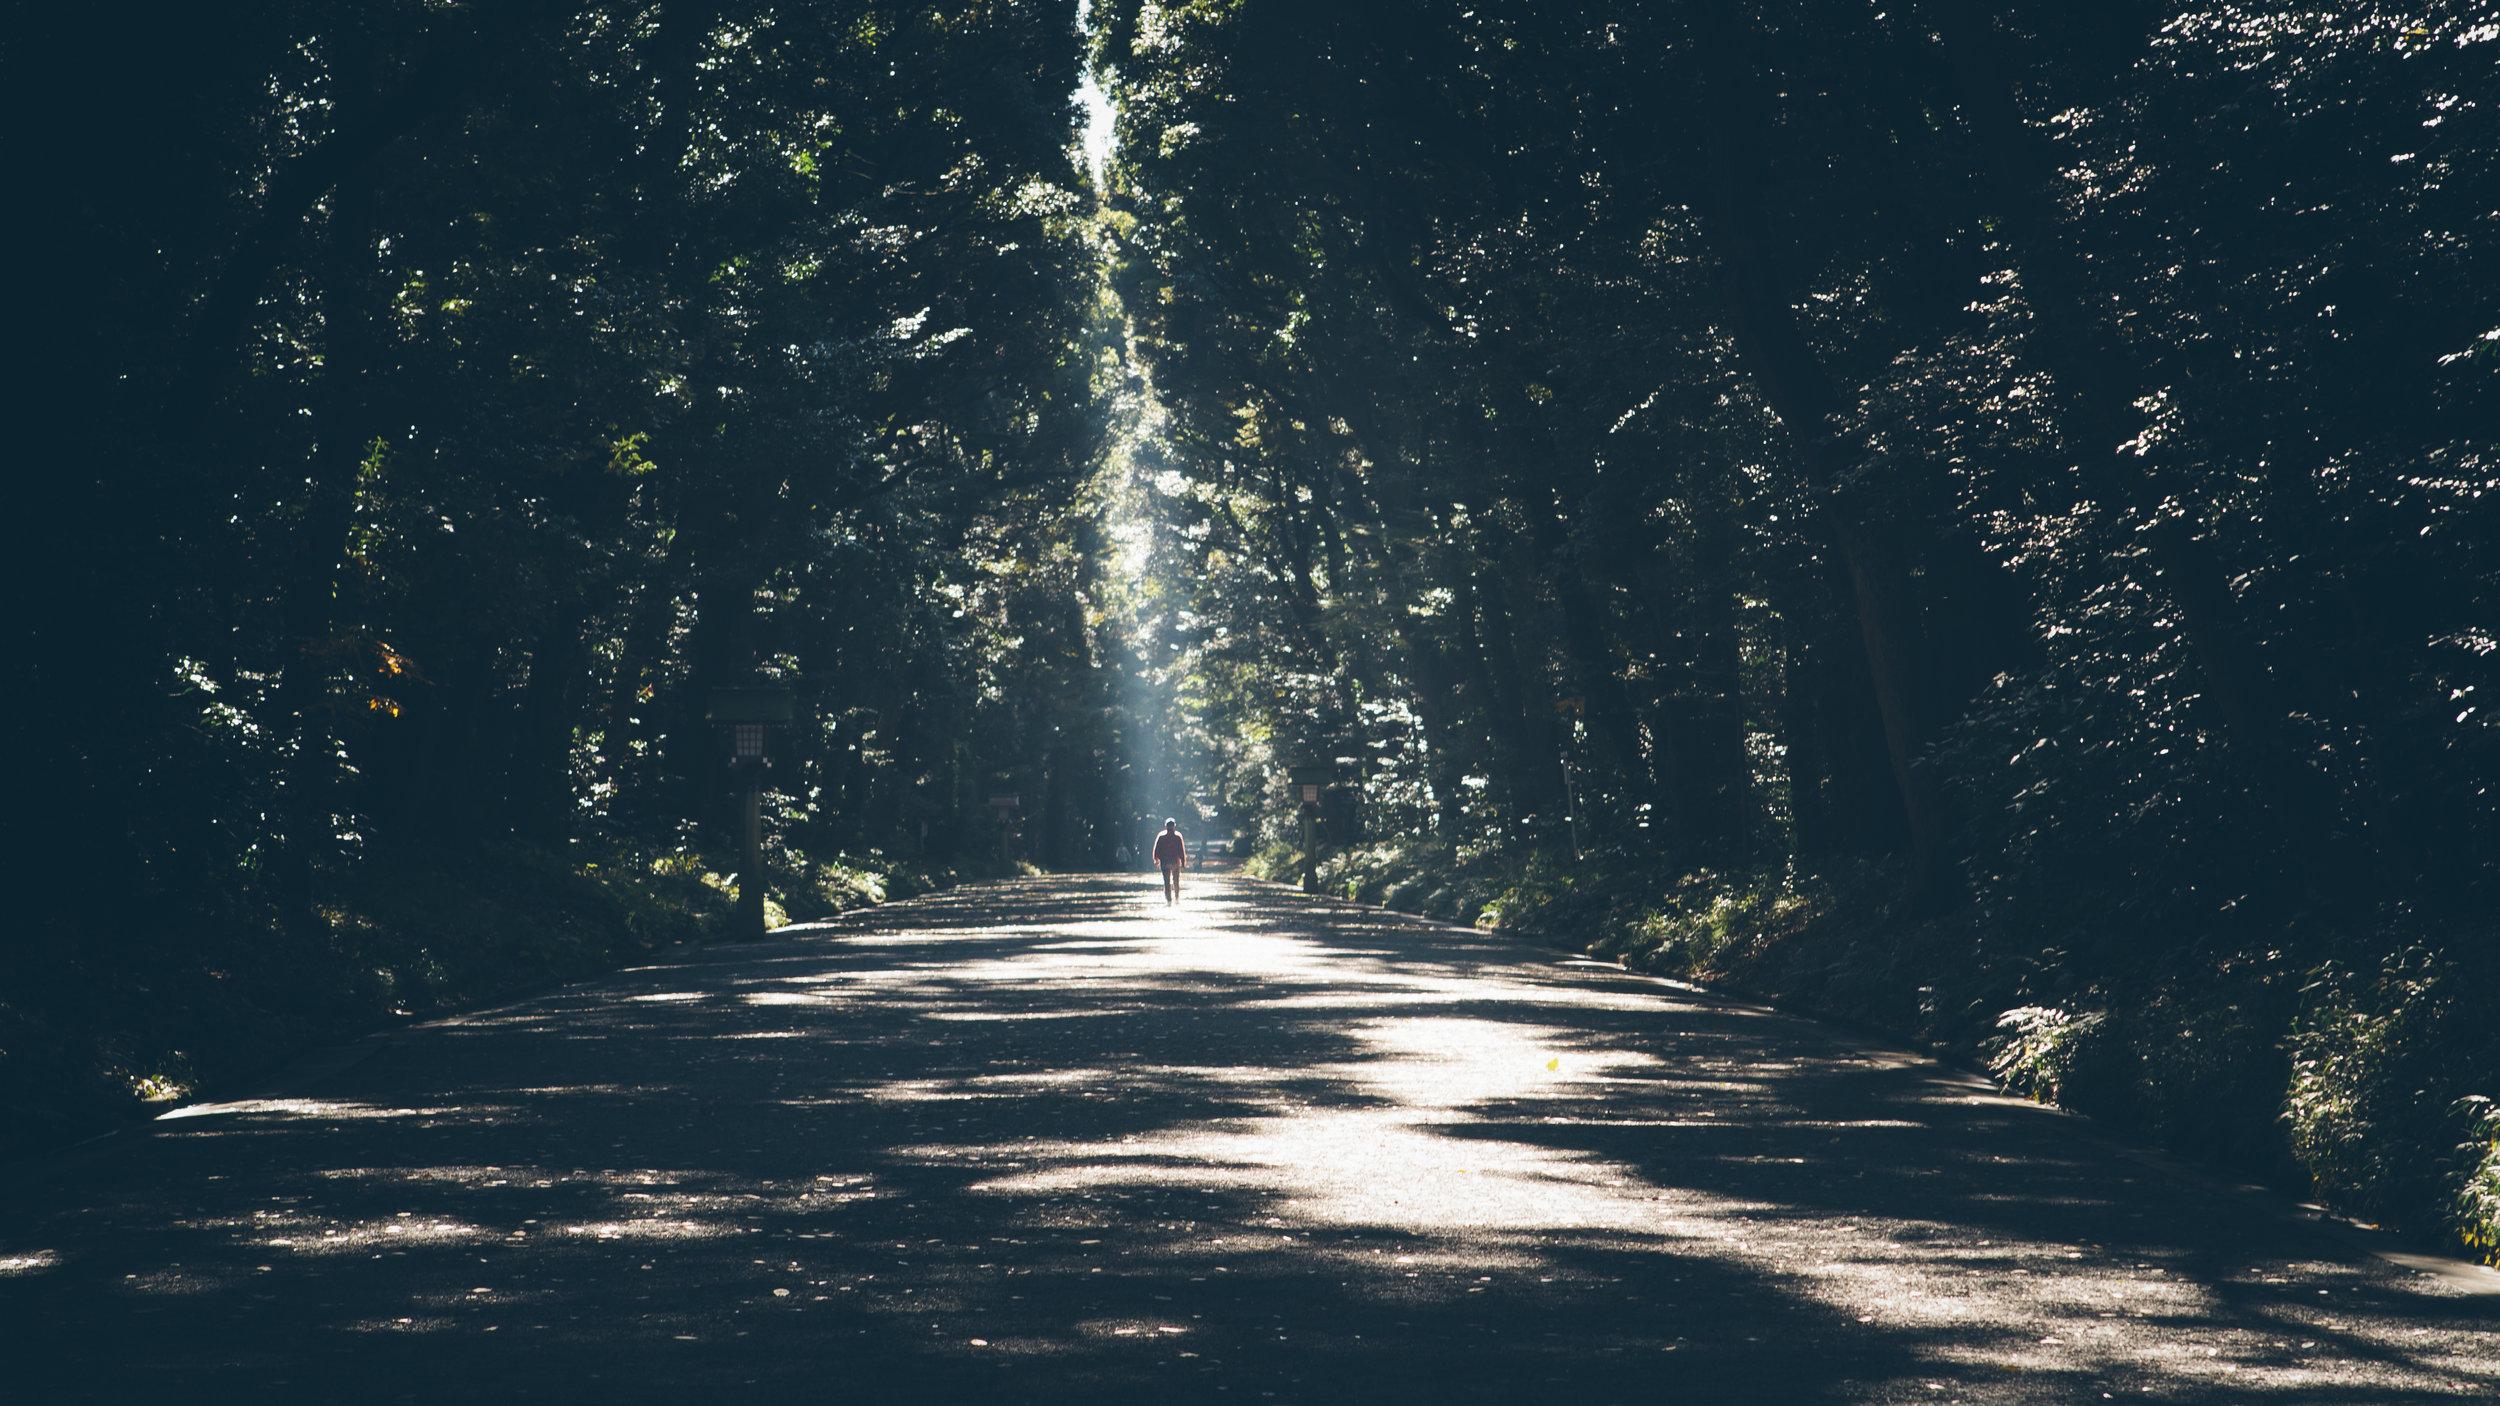 Walk+the+road.jpg